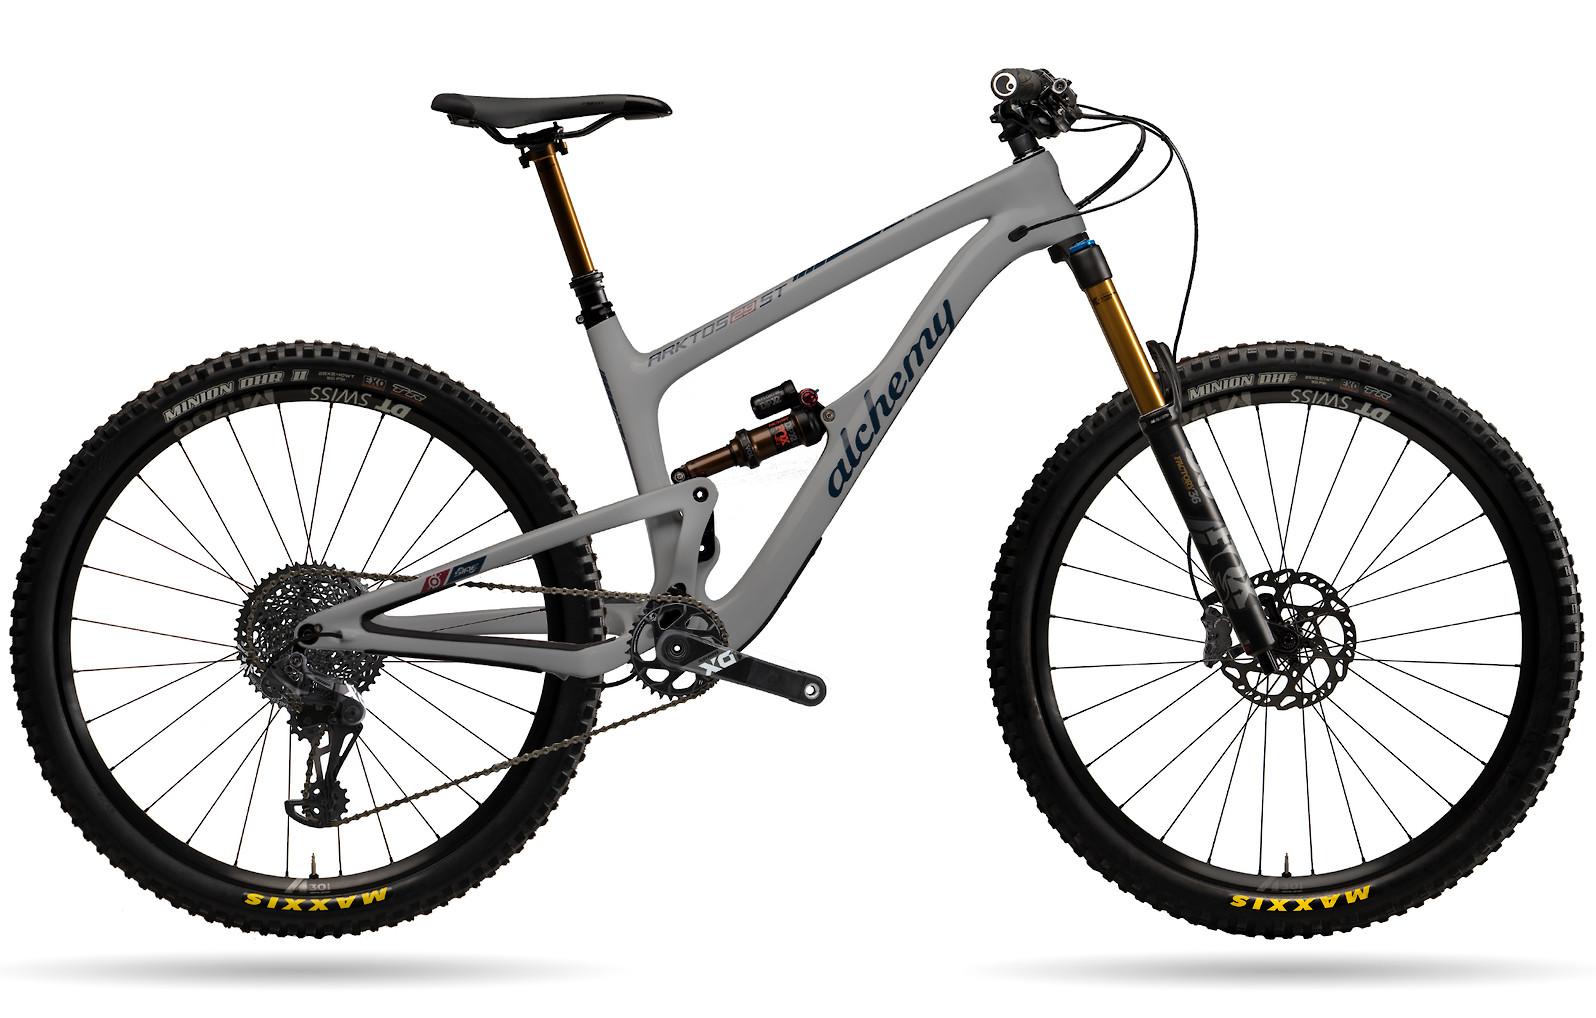 2019 Arktos 29ST Grey X01 Eagle Build